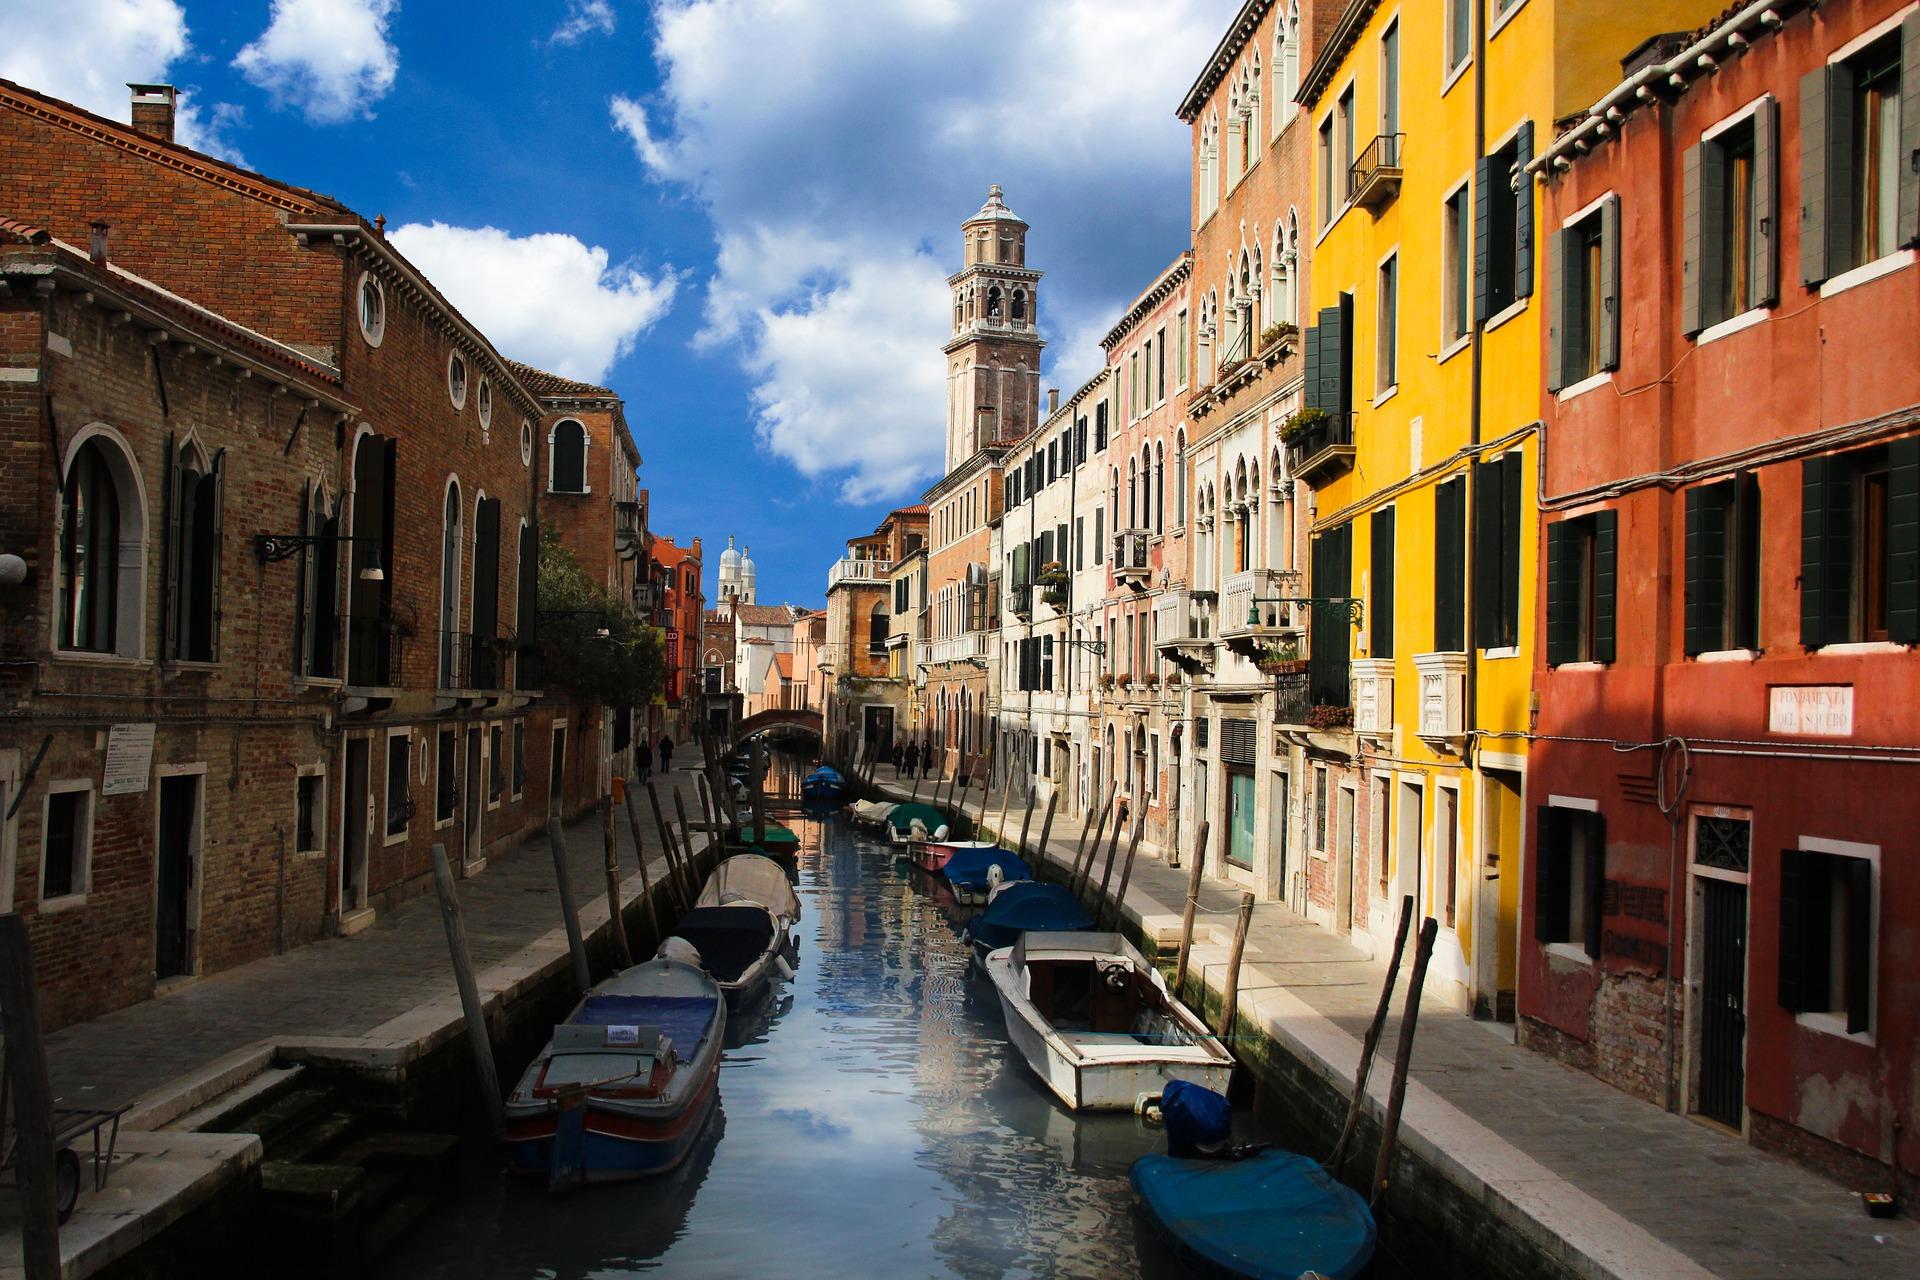 Affascinante Venezia